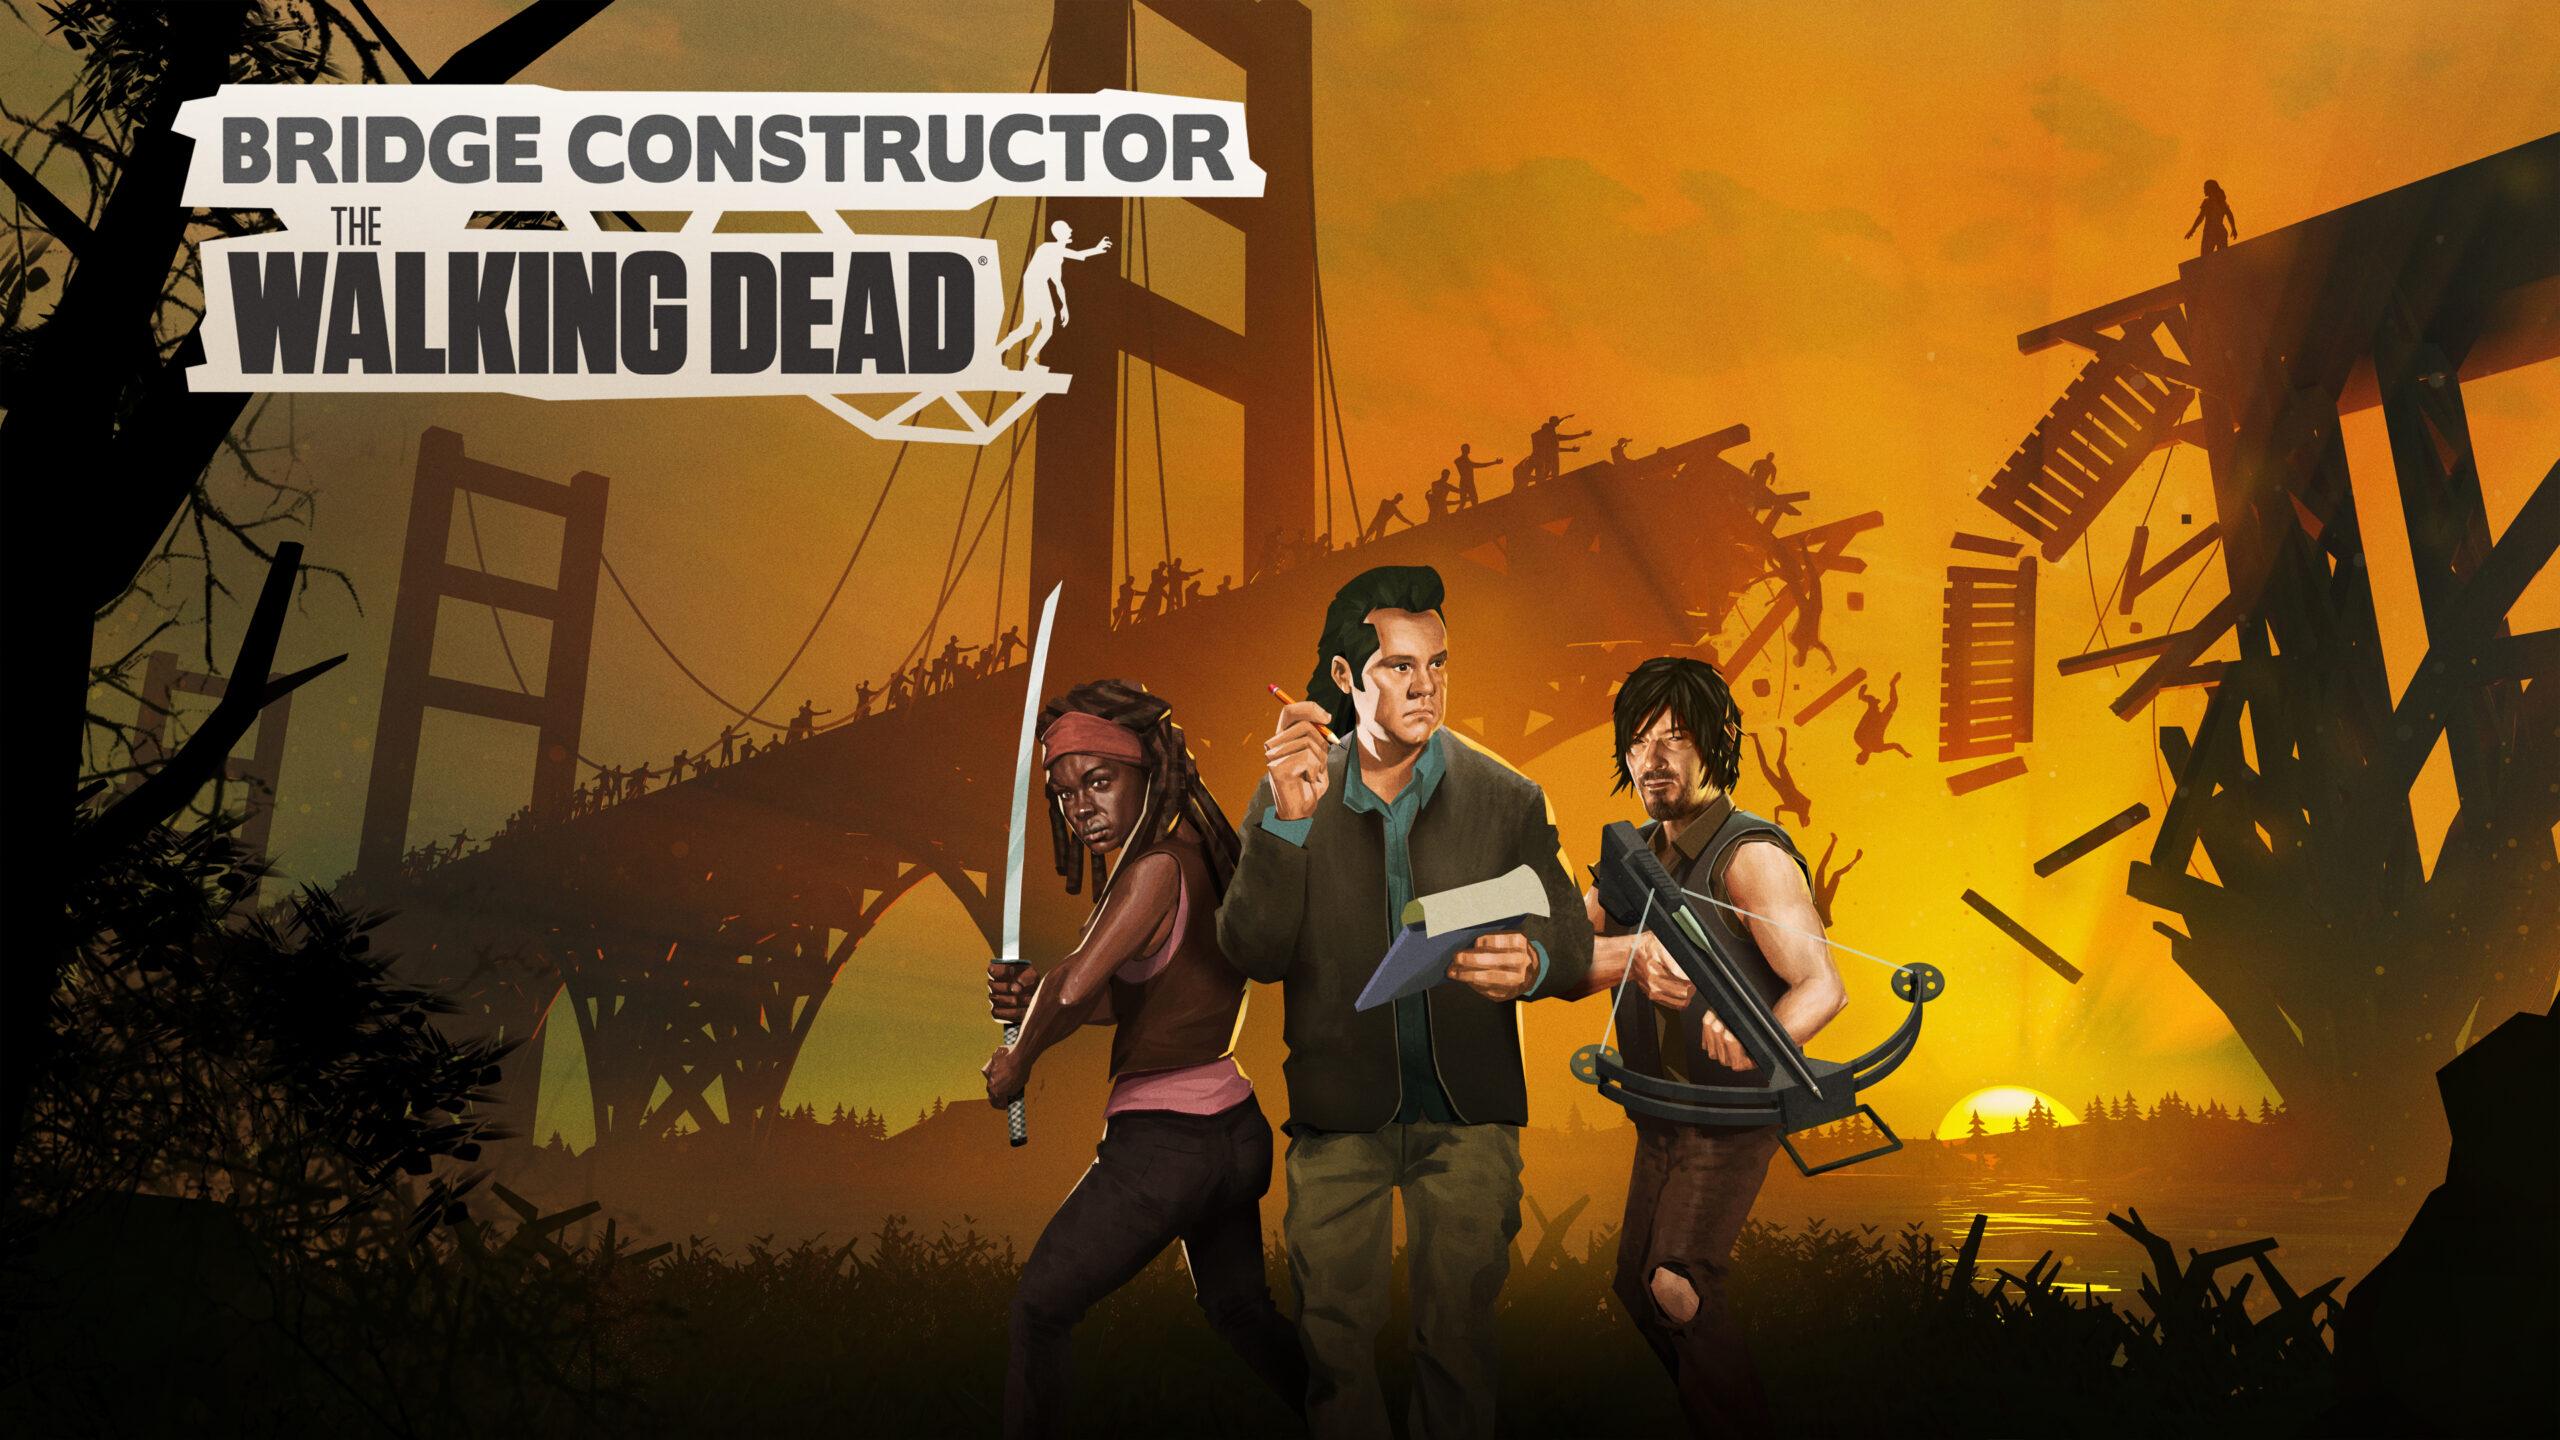 Bridge Constructor The Walking Dead Key Visual